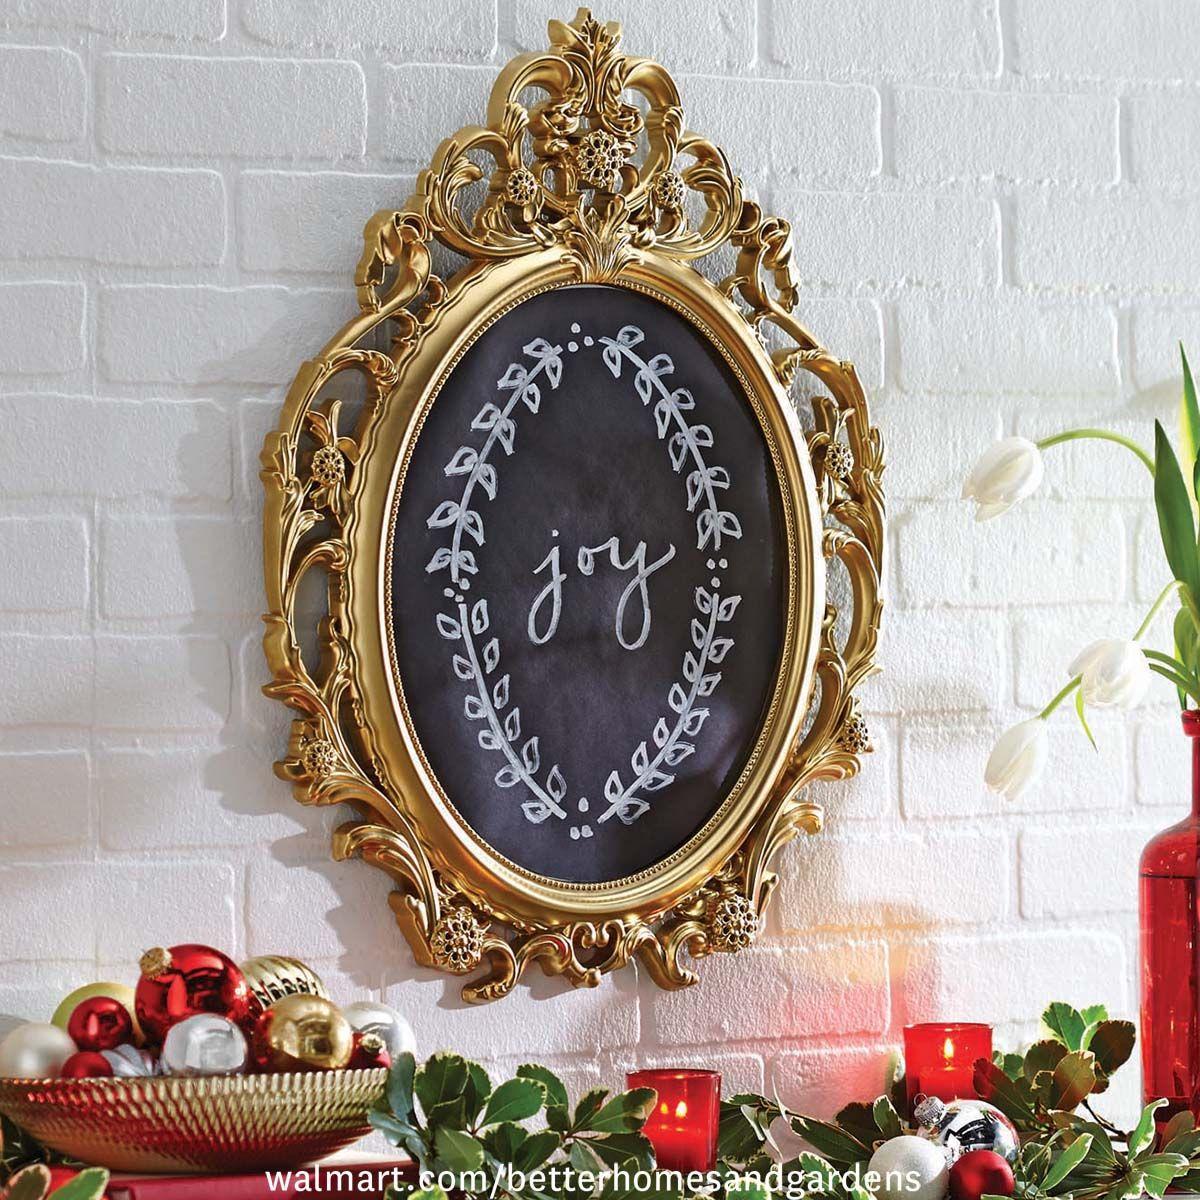 b3cd1185a05984a1d33b29149d23d53b - Better Homes And Gardens Baroque Mirror